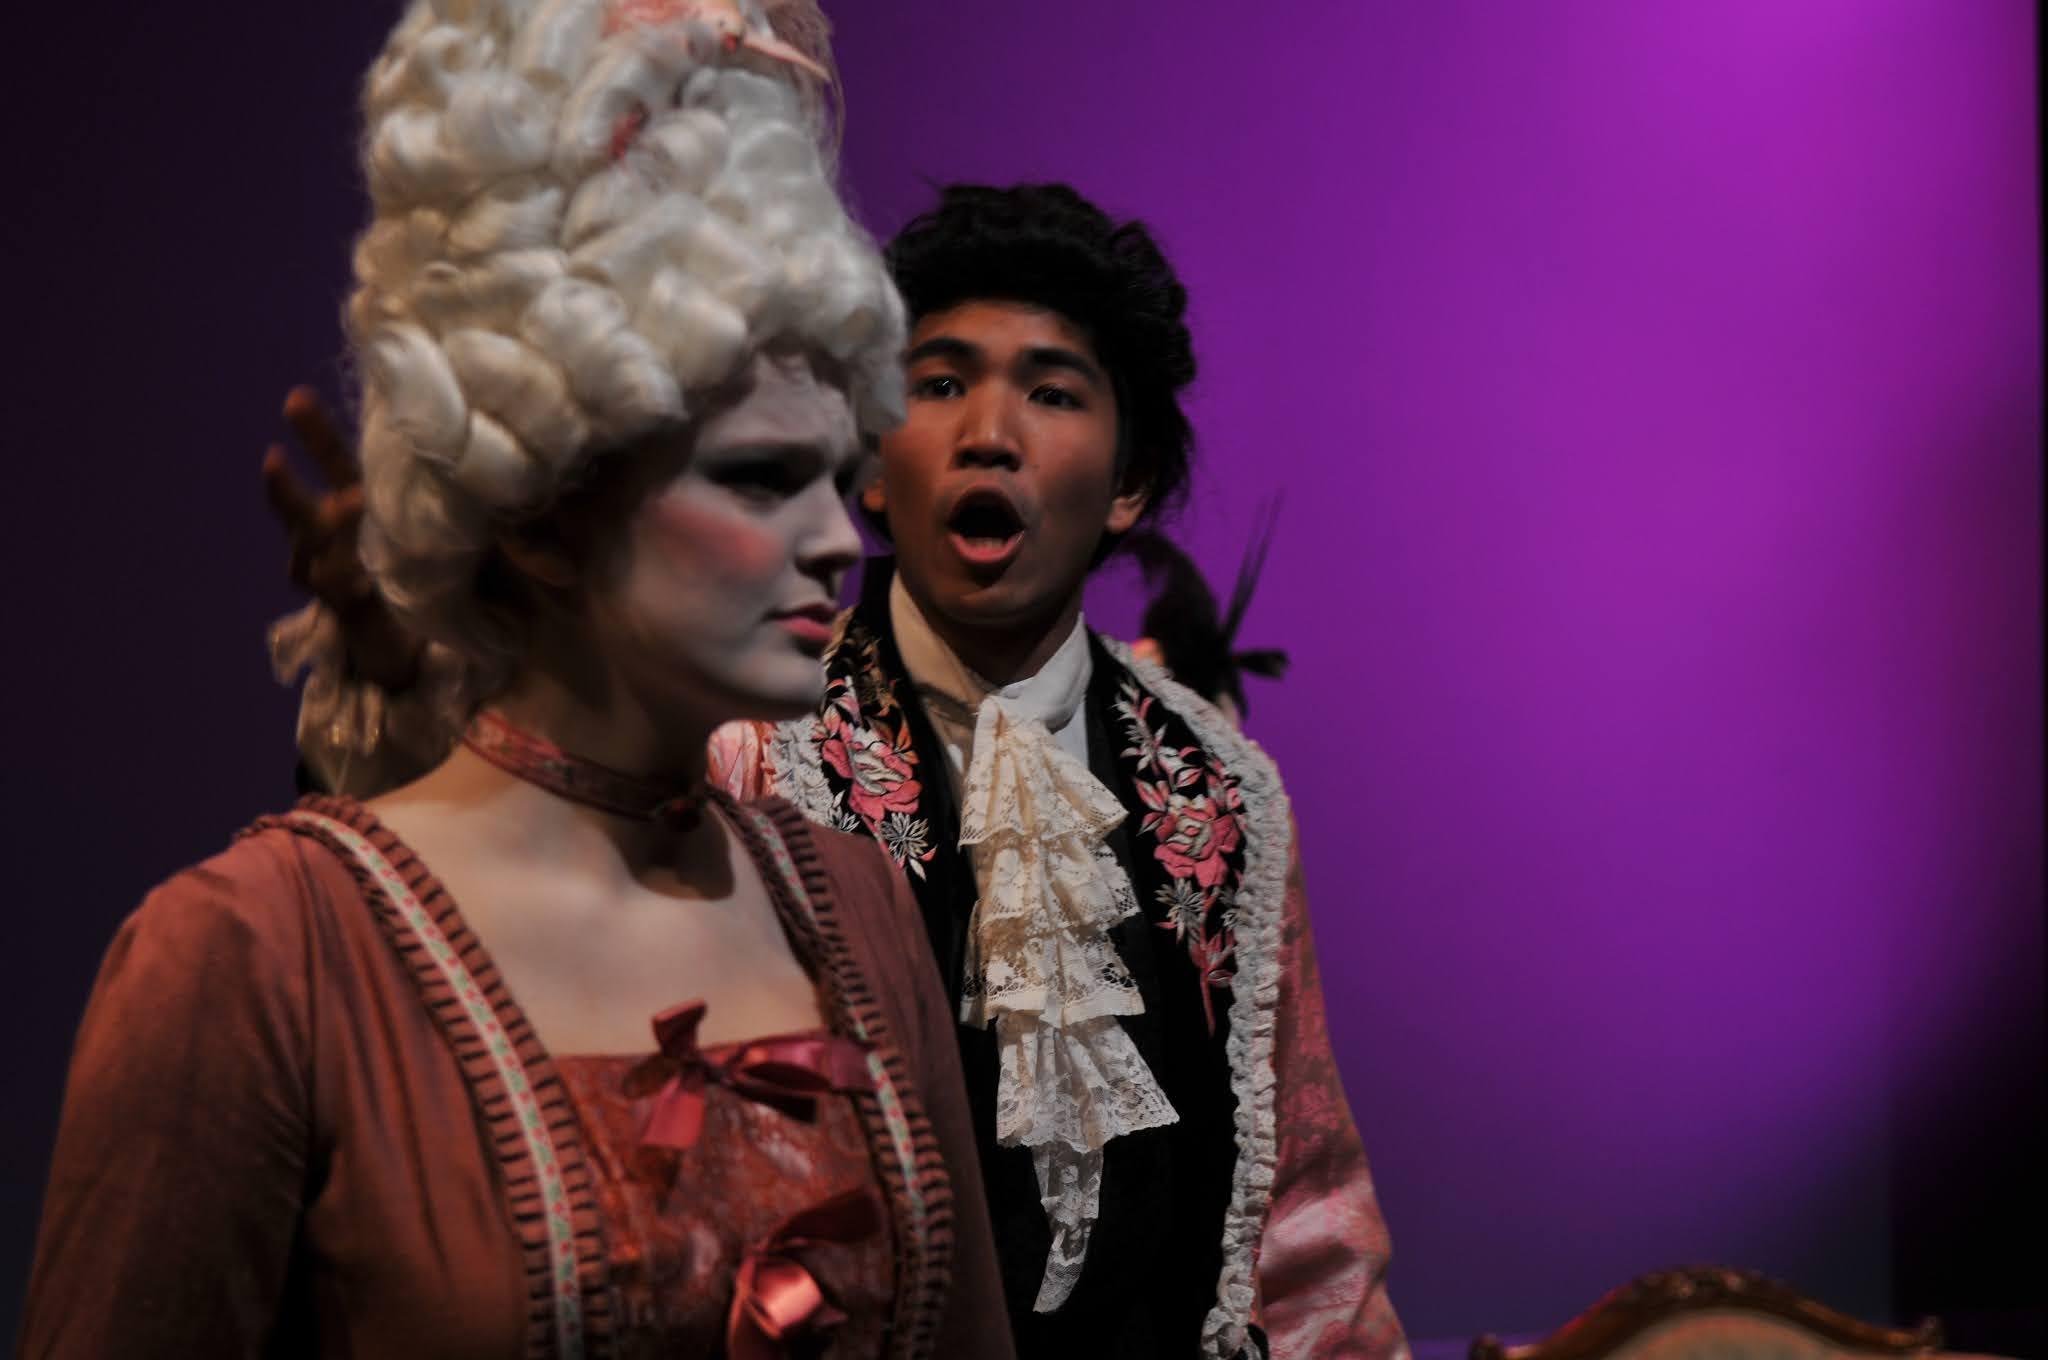 Caption: Interlochen Arts Academy opera theater students in the 2012-13 academy year, Credit: Interlochen Center for the Arts